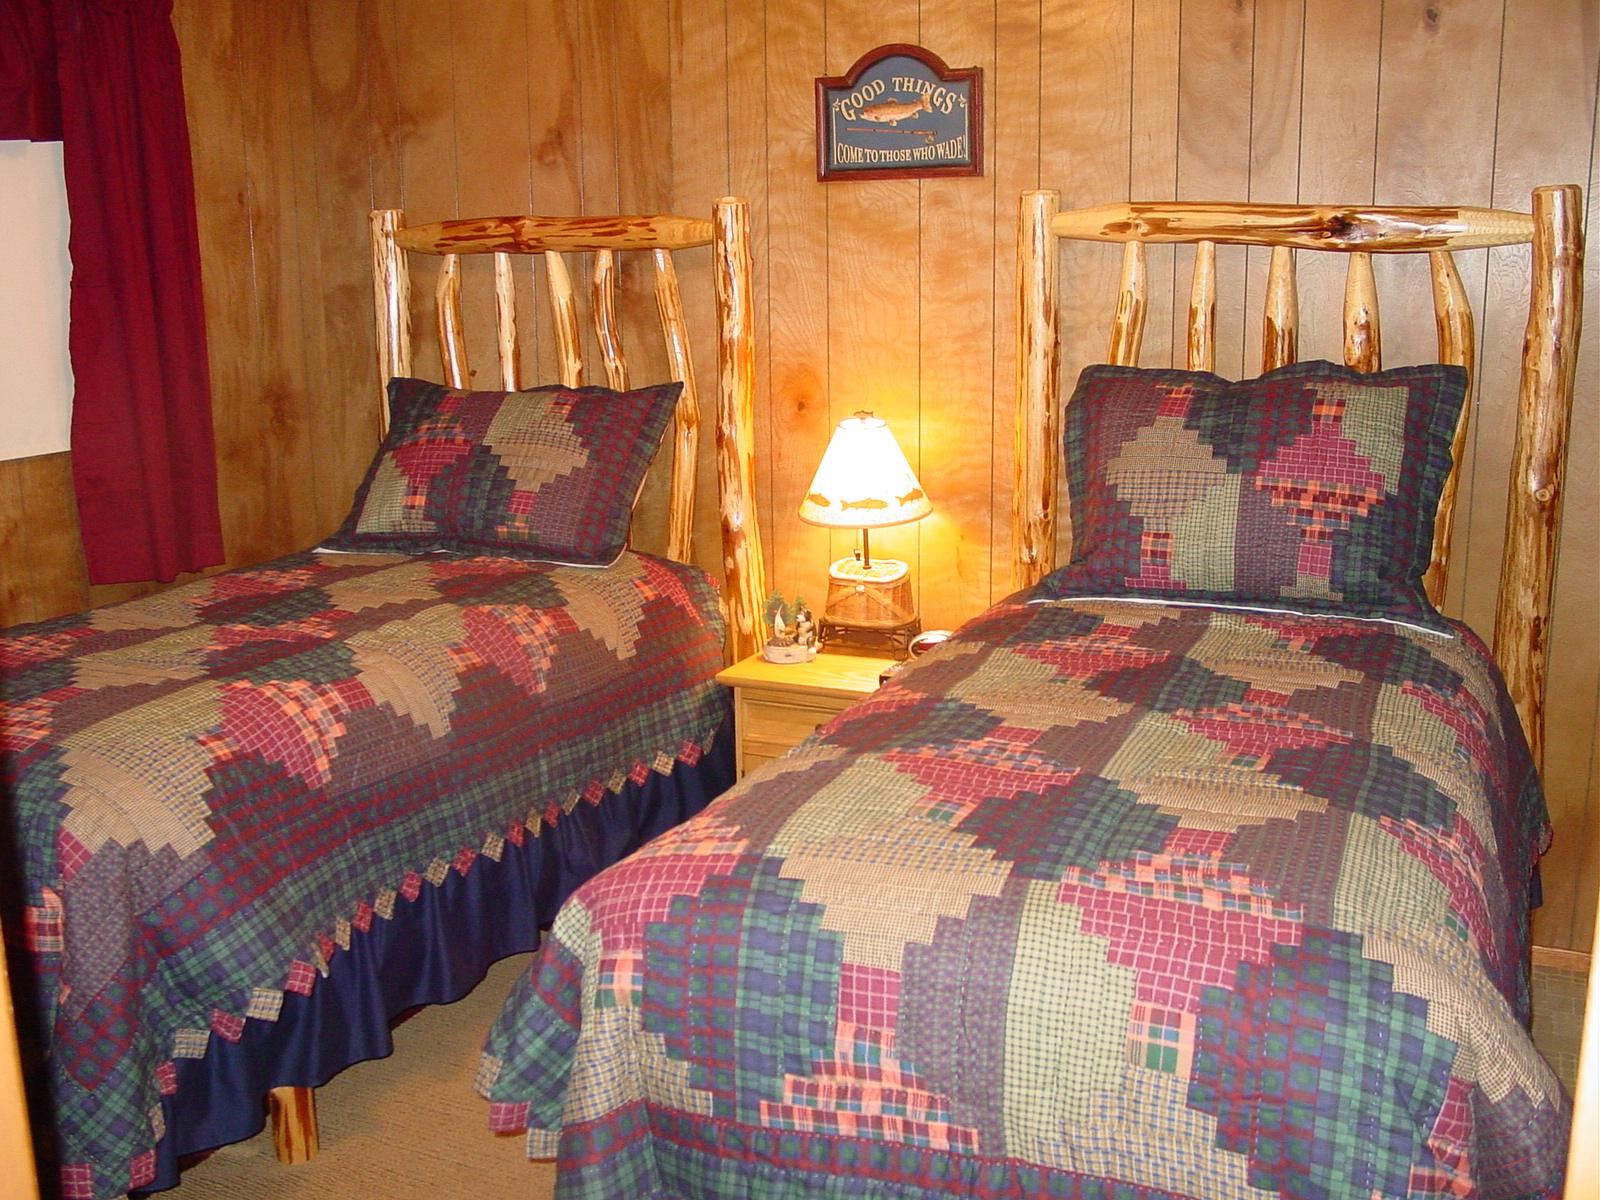 A Cozy River House - Bedroom #2